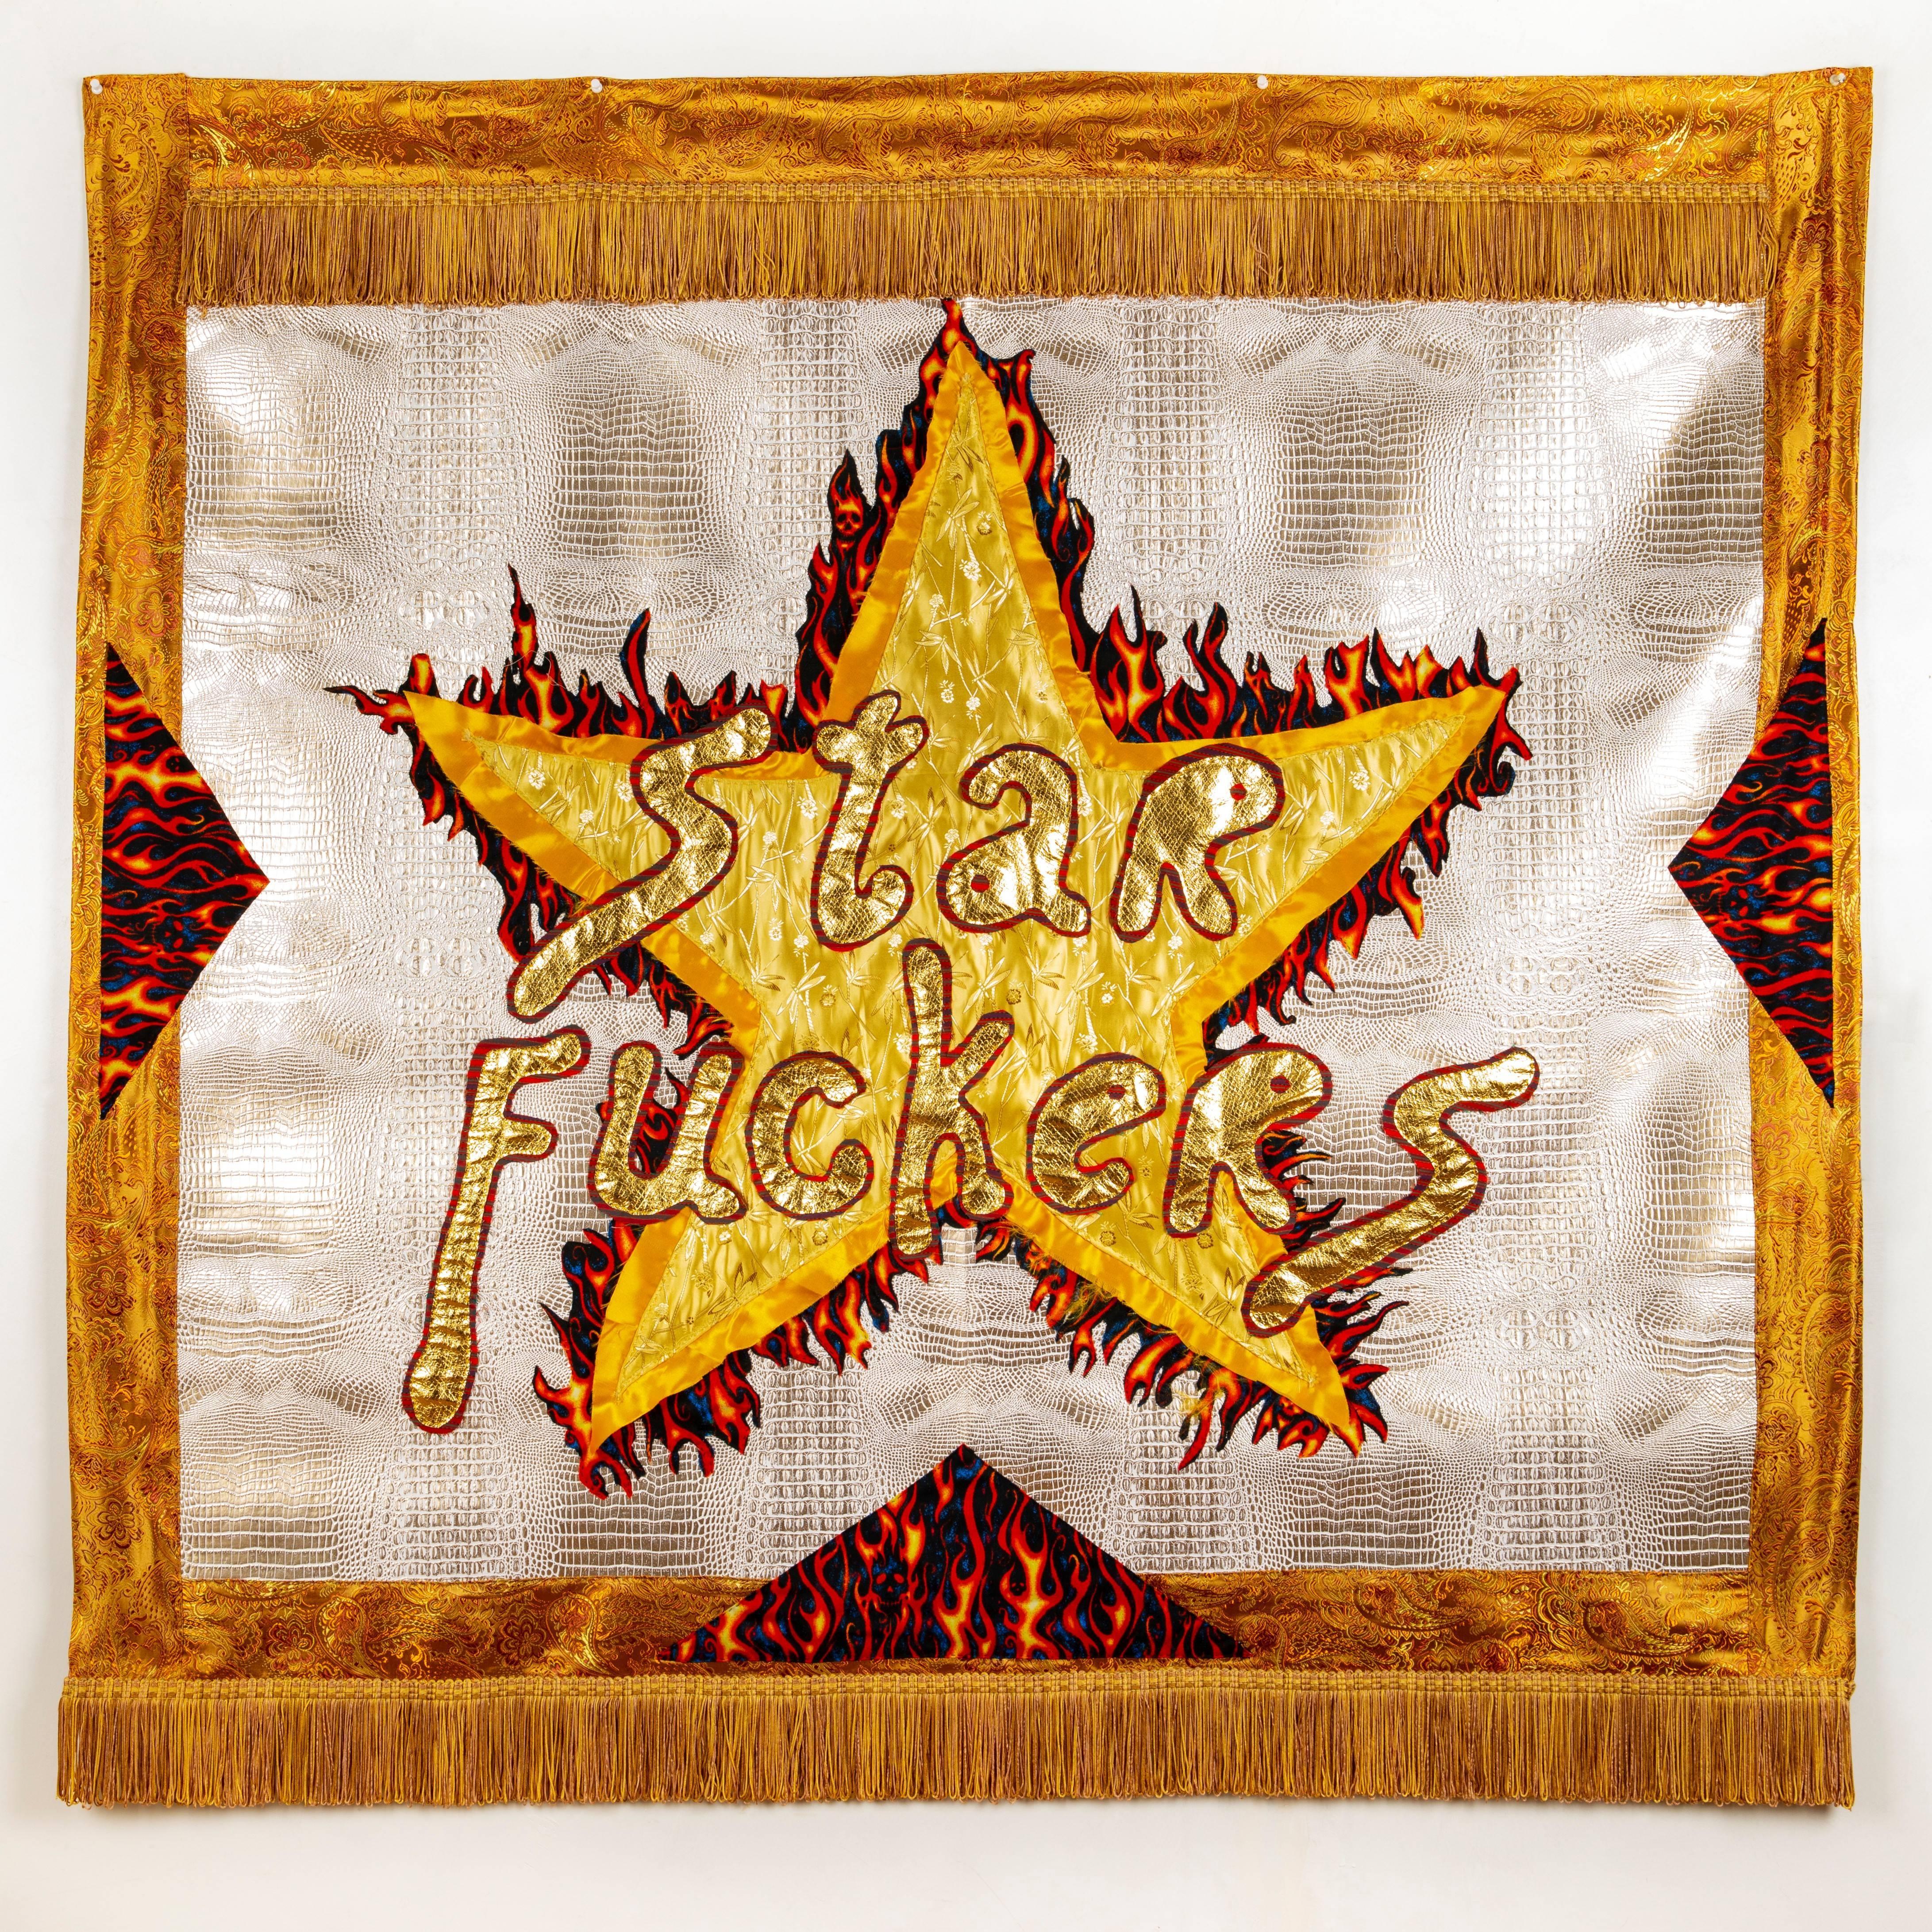 Rita Valley, Star Fuckers, 2018, fabric, pleather, fringe, banner